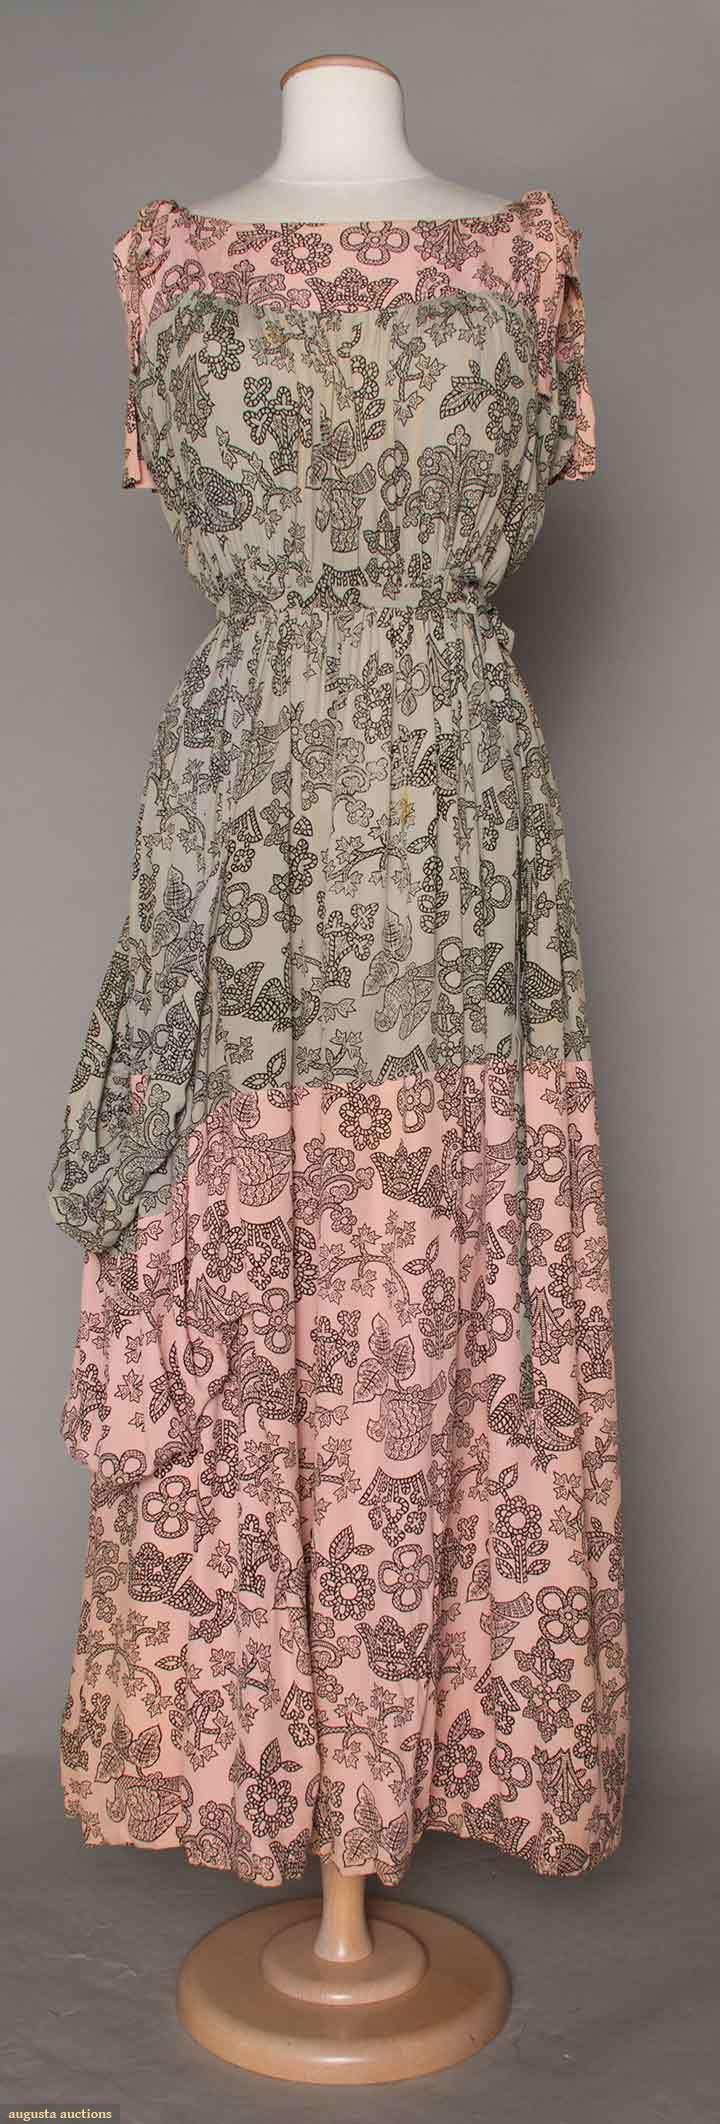 Vintage 1940s Color Block Swag Dress: ADRIAN PRINTED SILK SUMMER DRESS, 1940s Blue & Pink Color